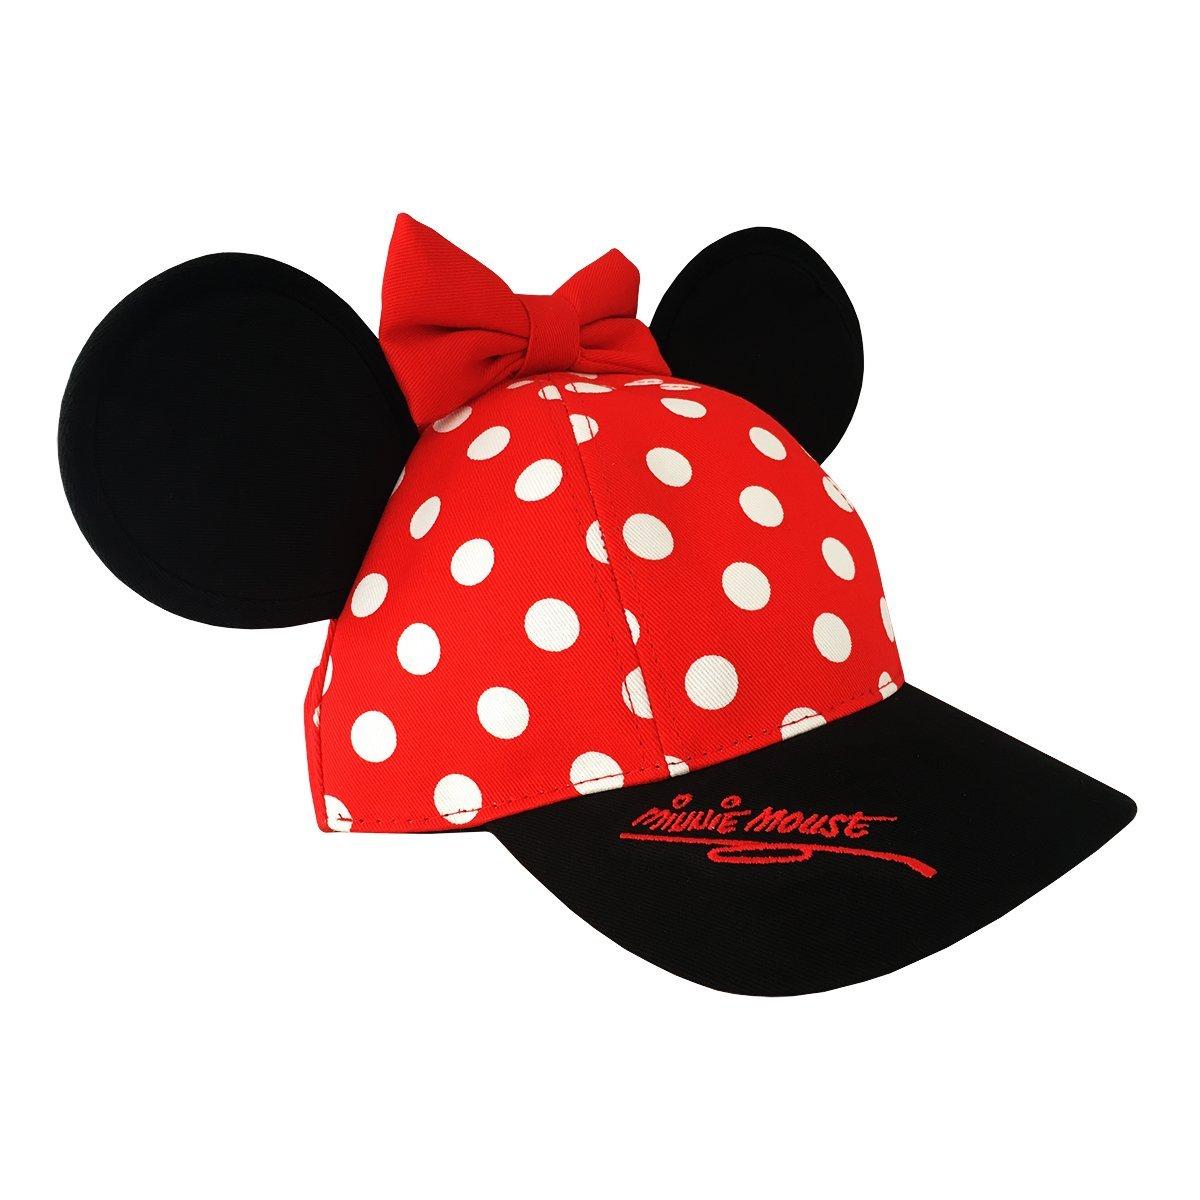 Amazon.com  Minnie Mouse Disneyland Polka Dot Snapback Cap with Ears -  Disney Parks Exclusive  Clothing b02c809823